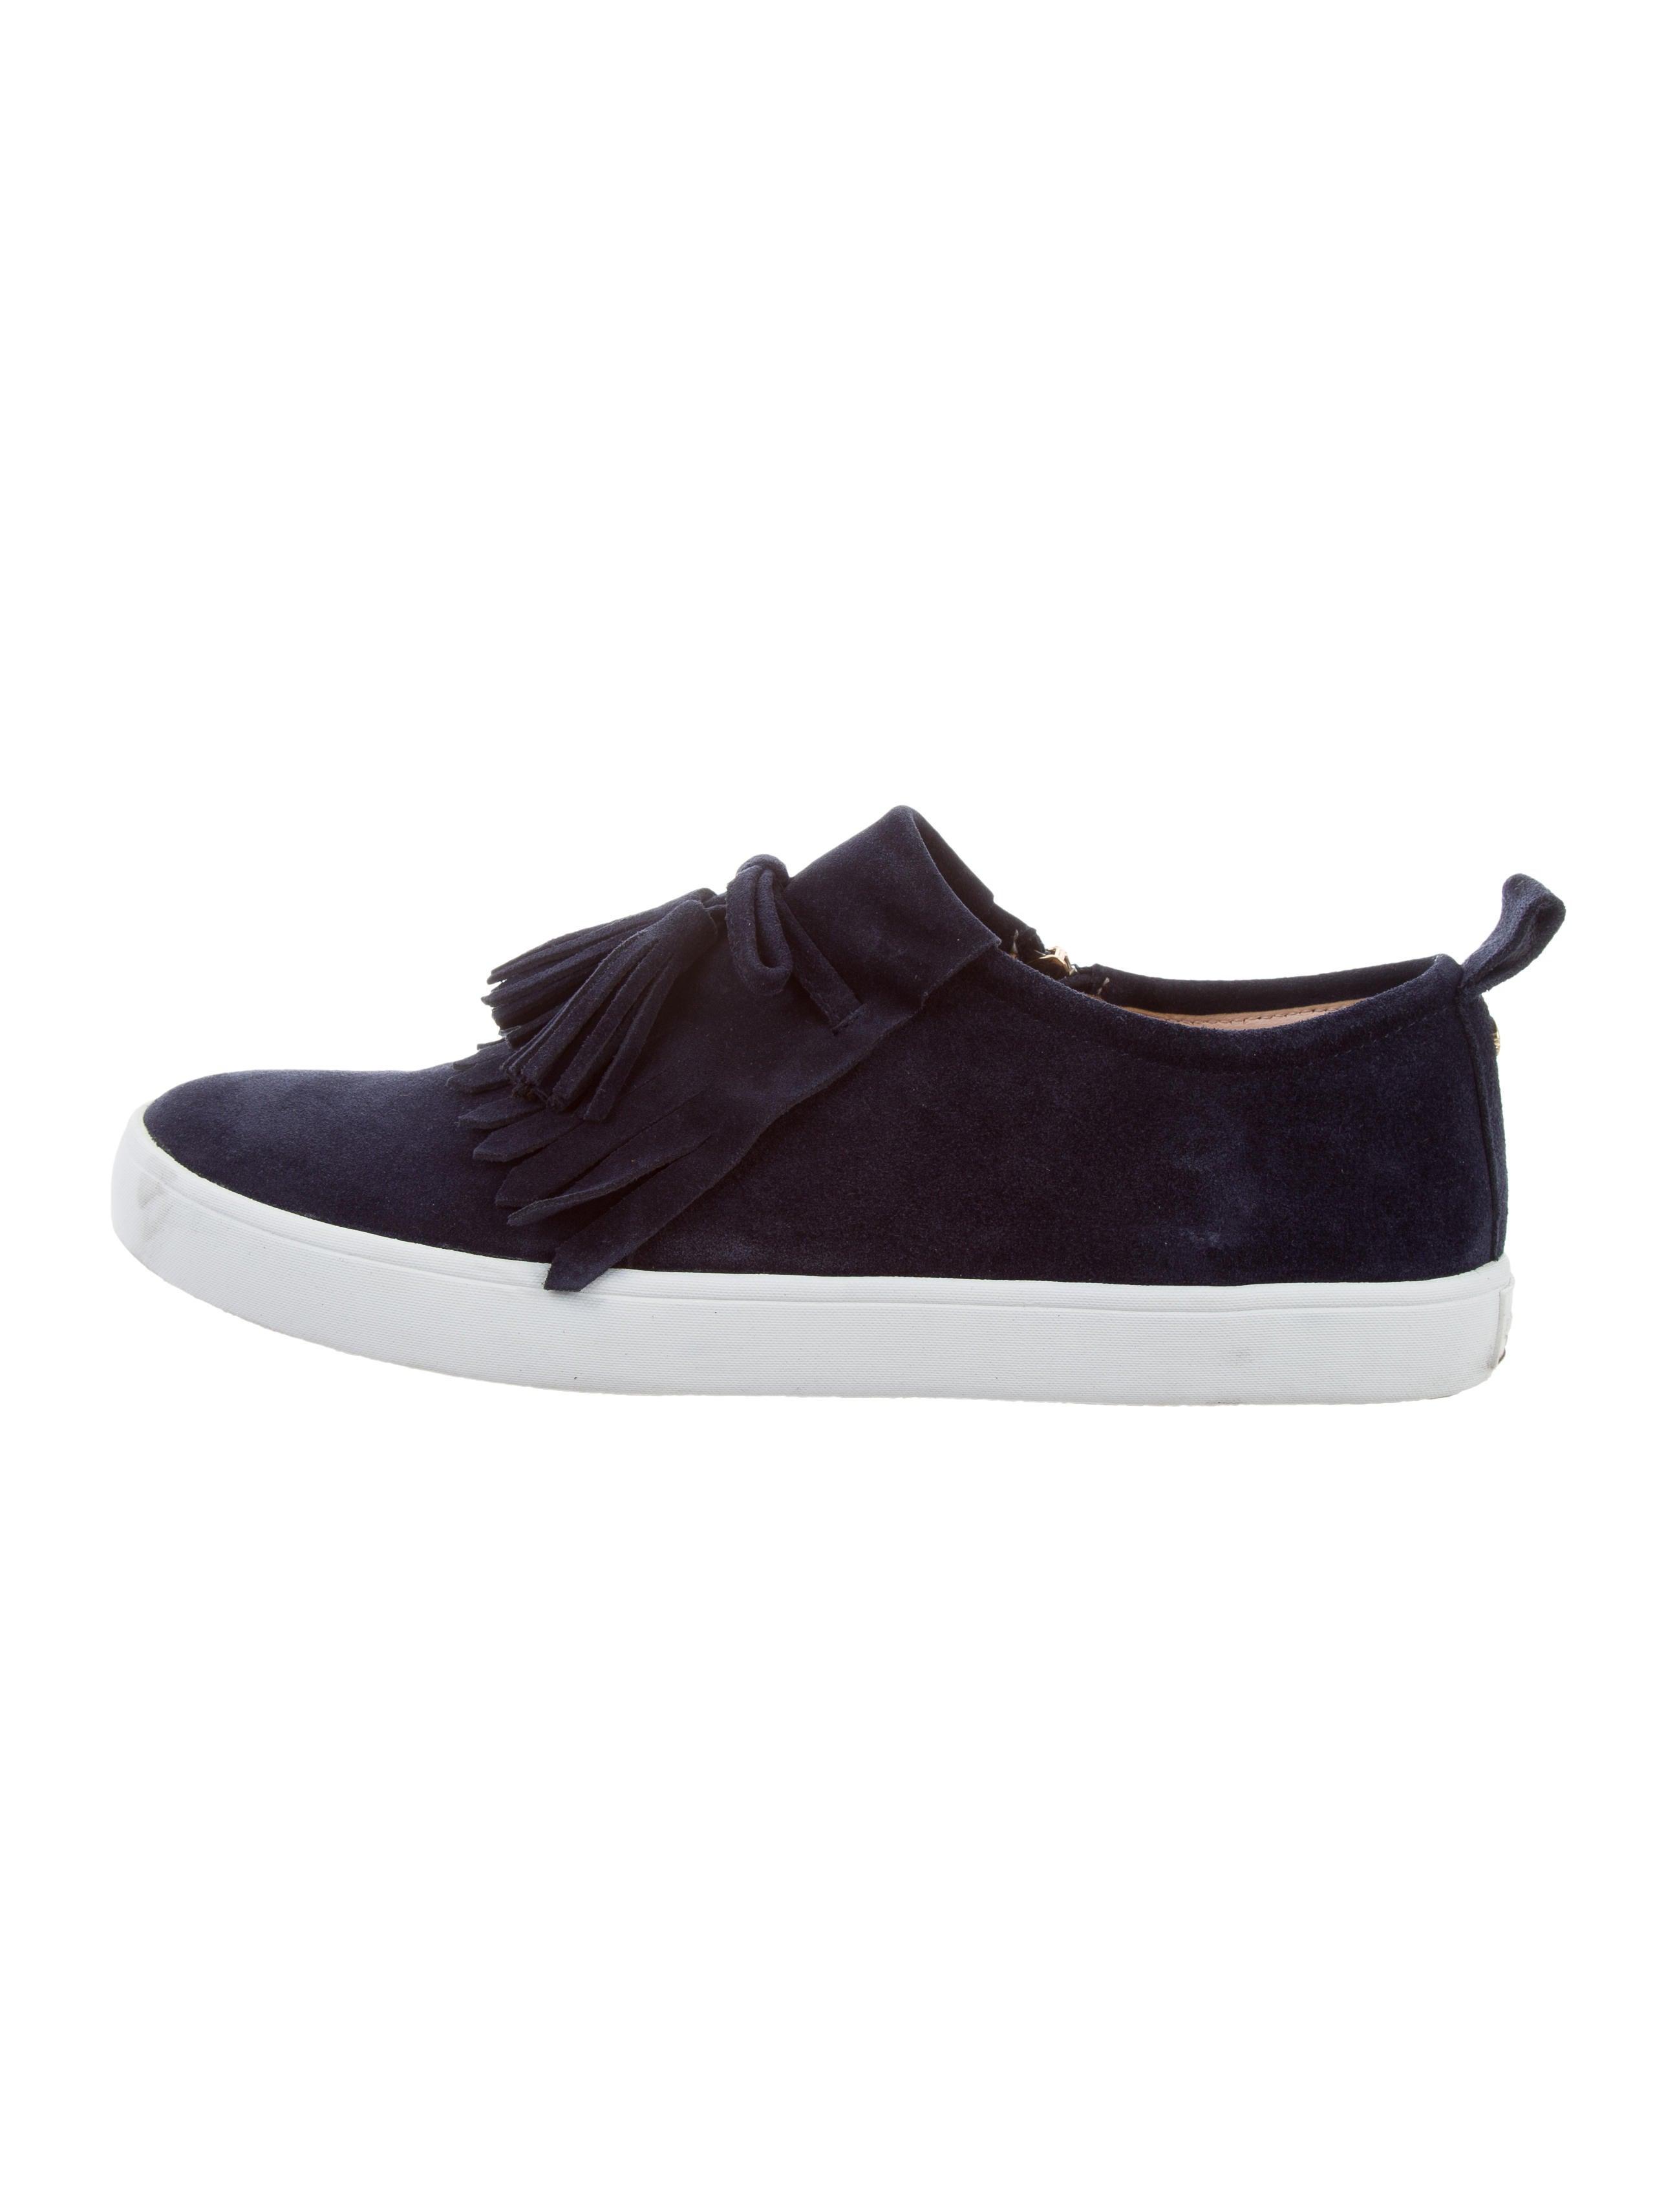 868b6a7d333e Kate Spade New York Lenna Tassel Sneakers - Shoes - WKA65736